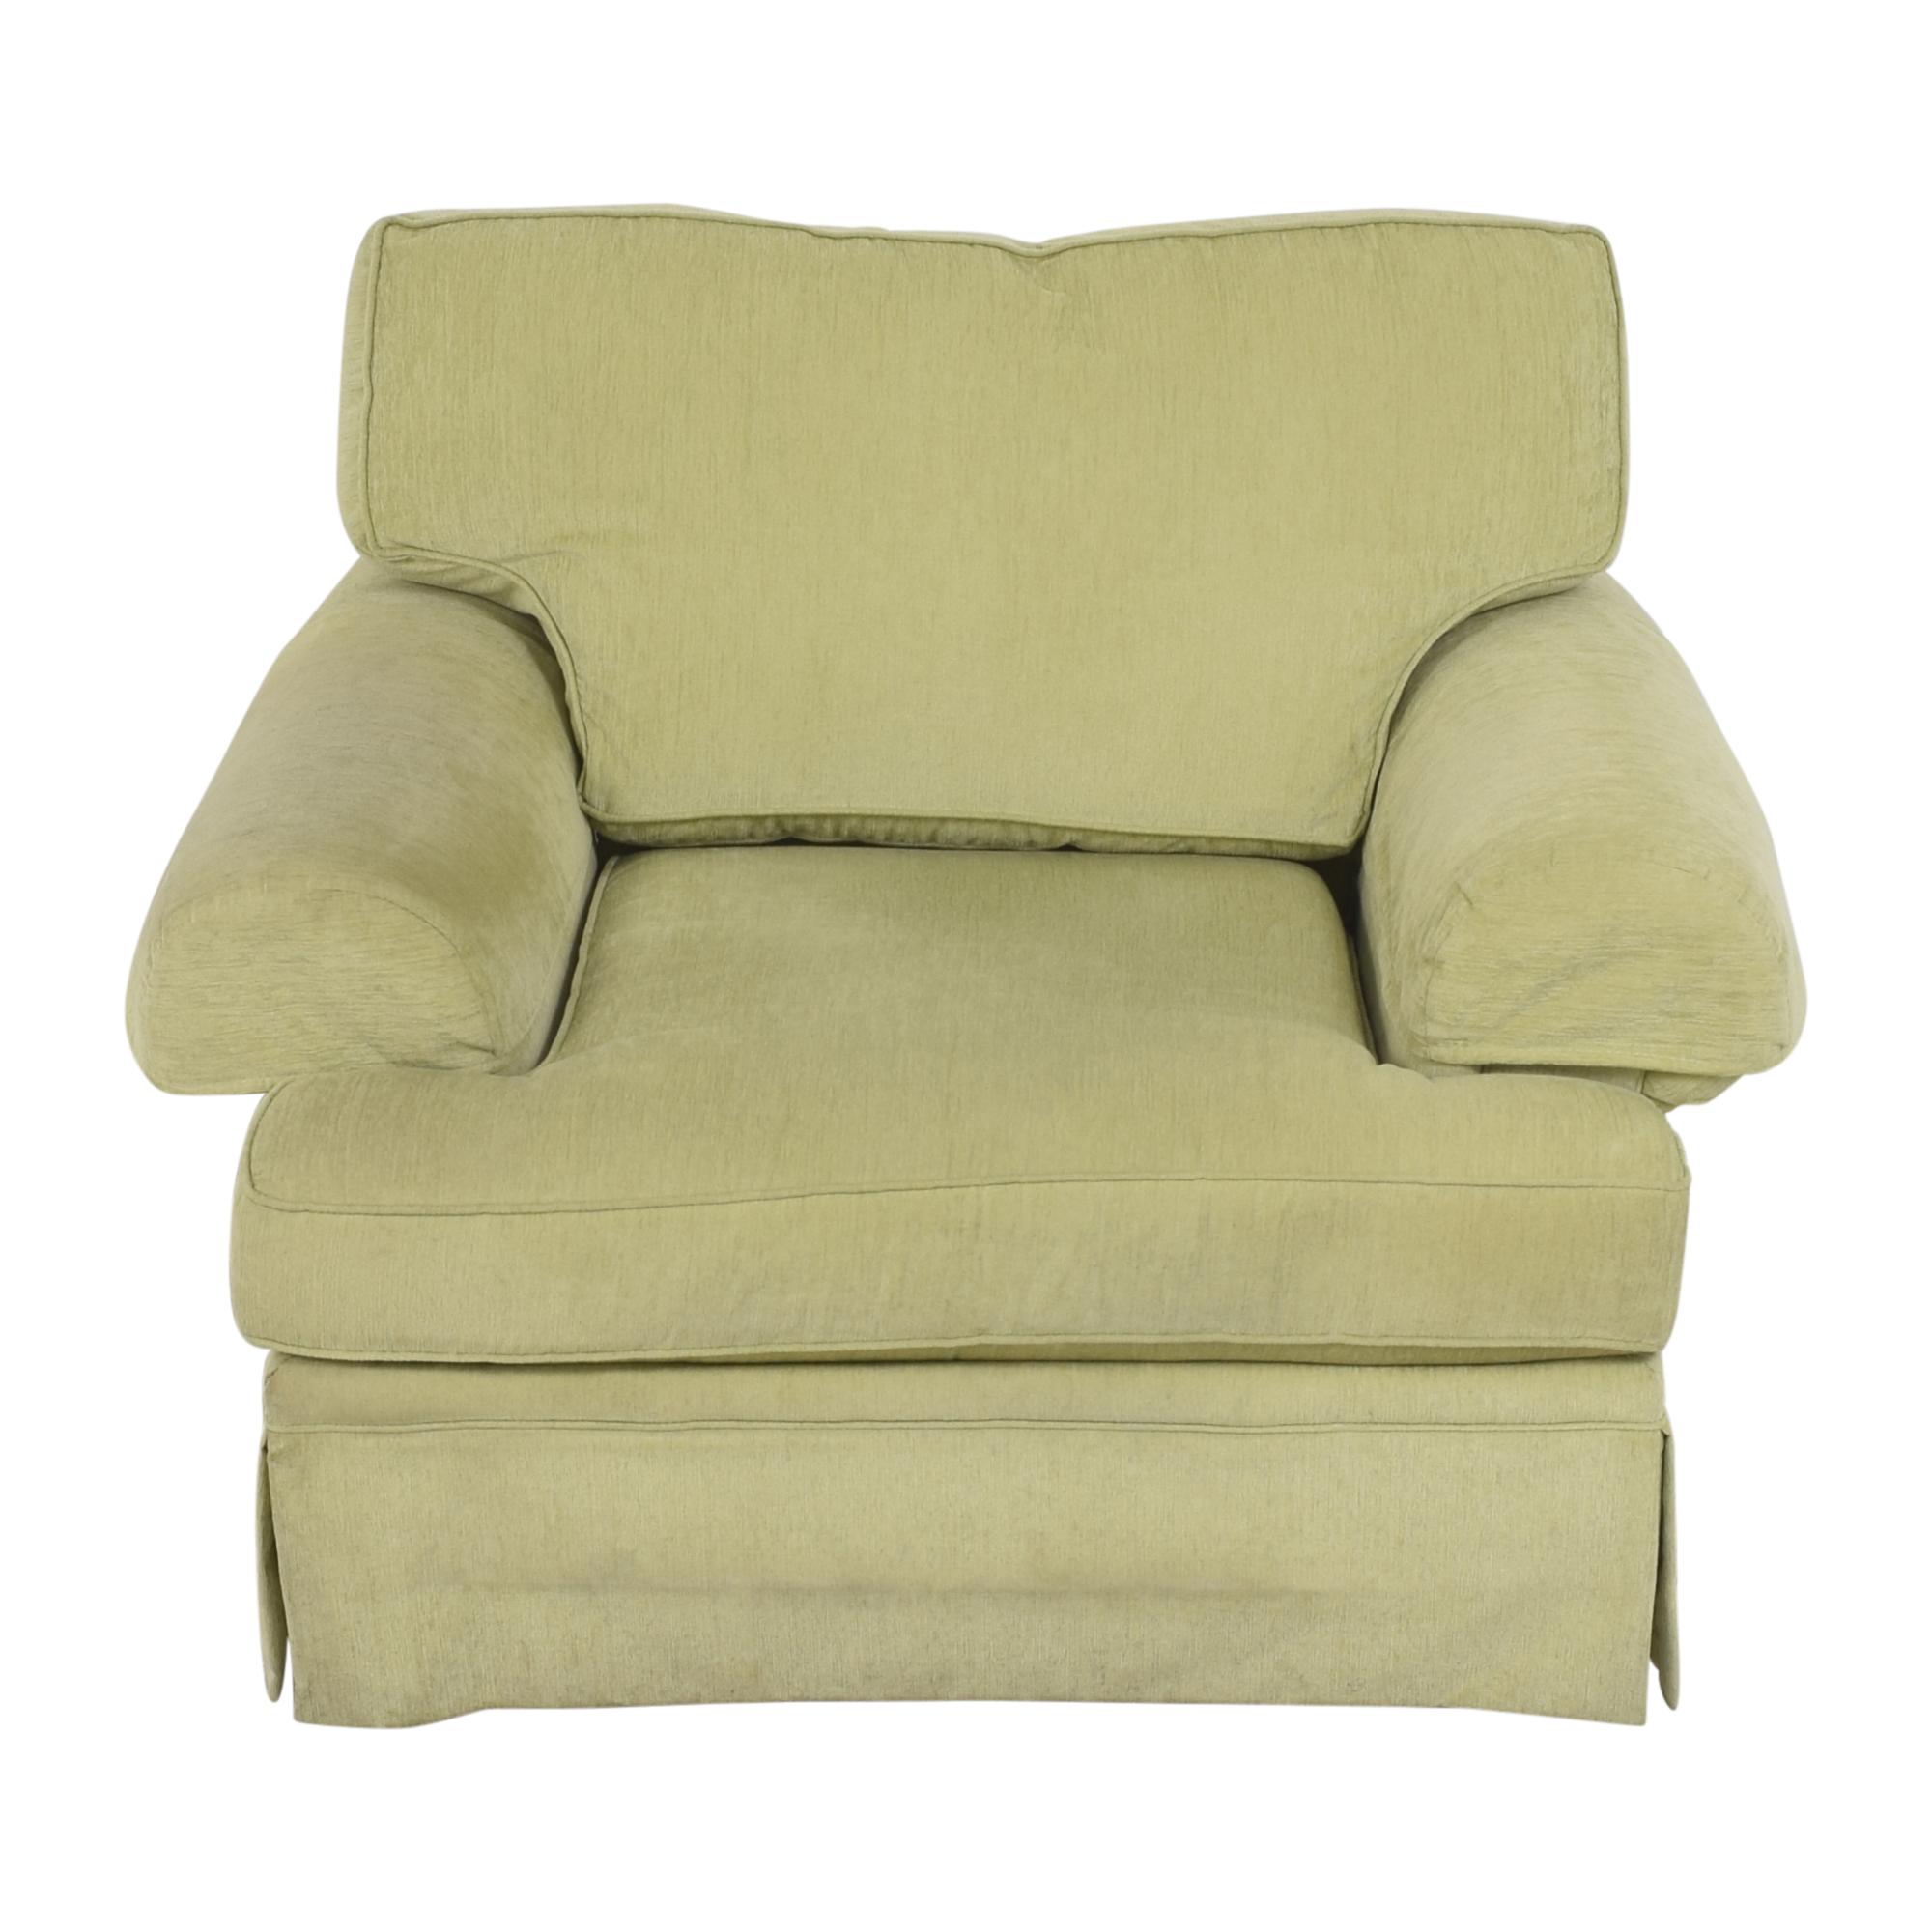 Flexsteel Flexsteel Skirted Chair and a Half used